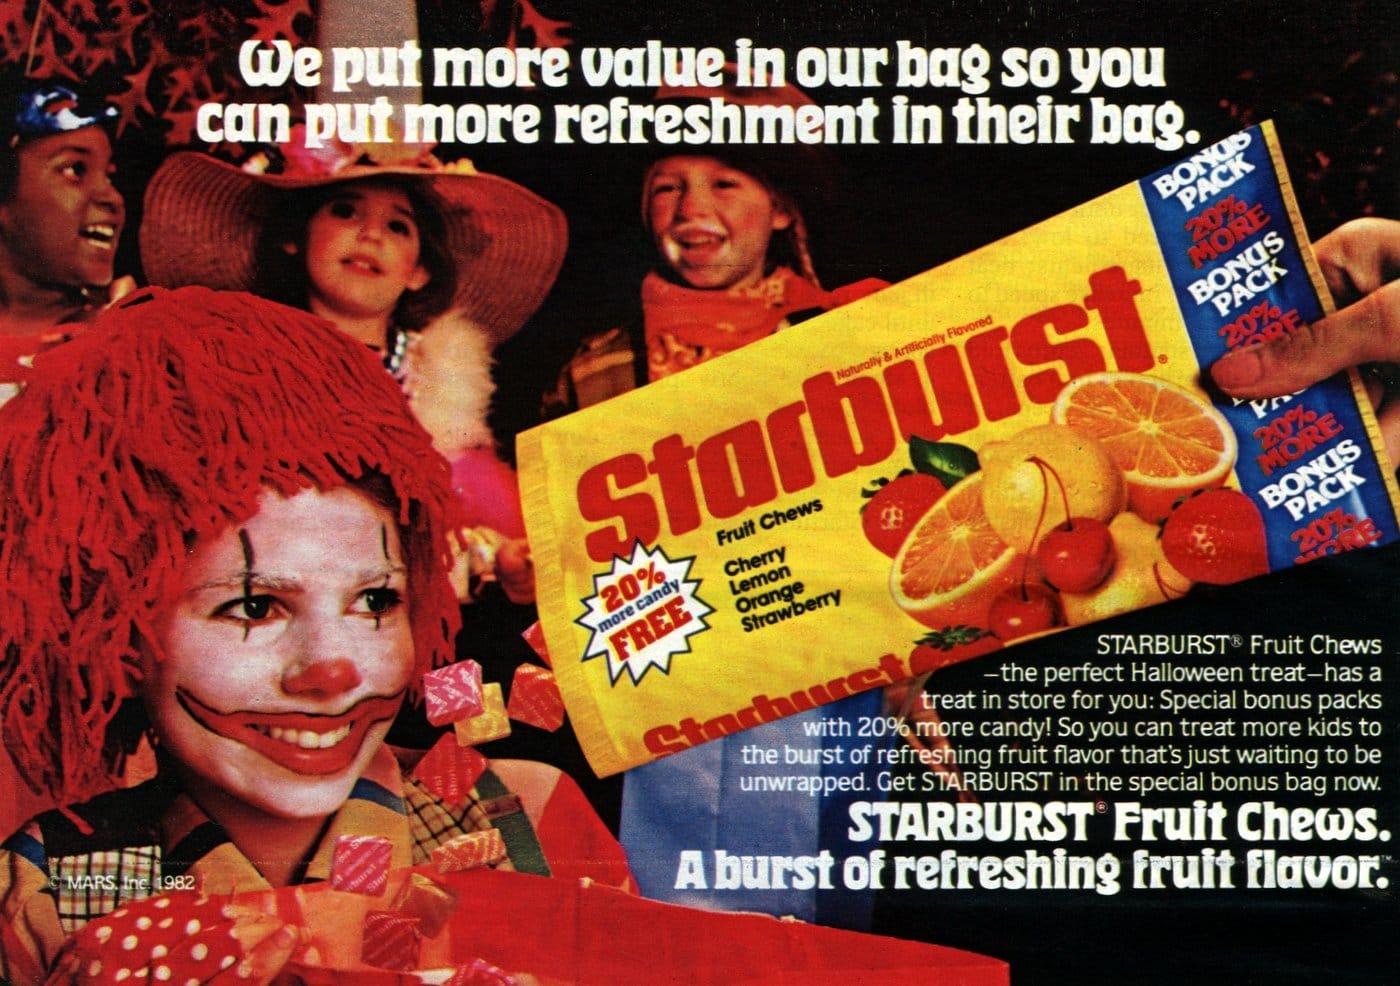 Mars Starburst fruit chews candy (1982)